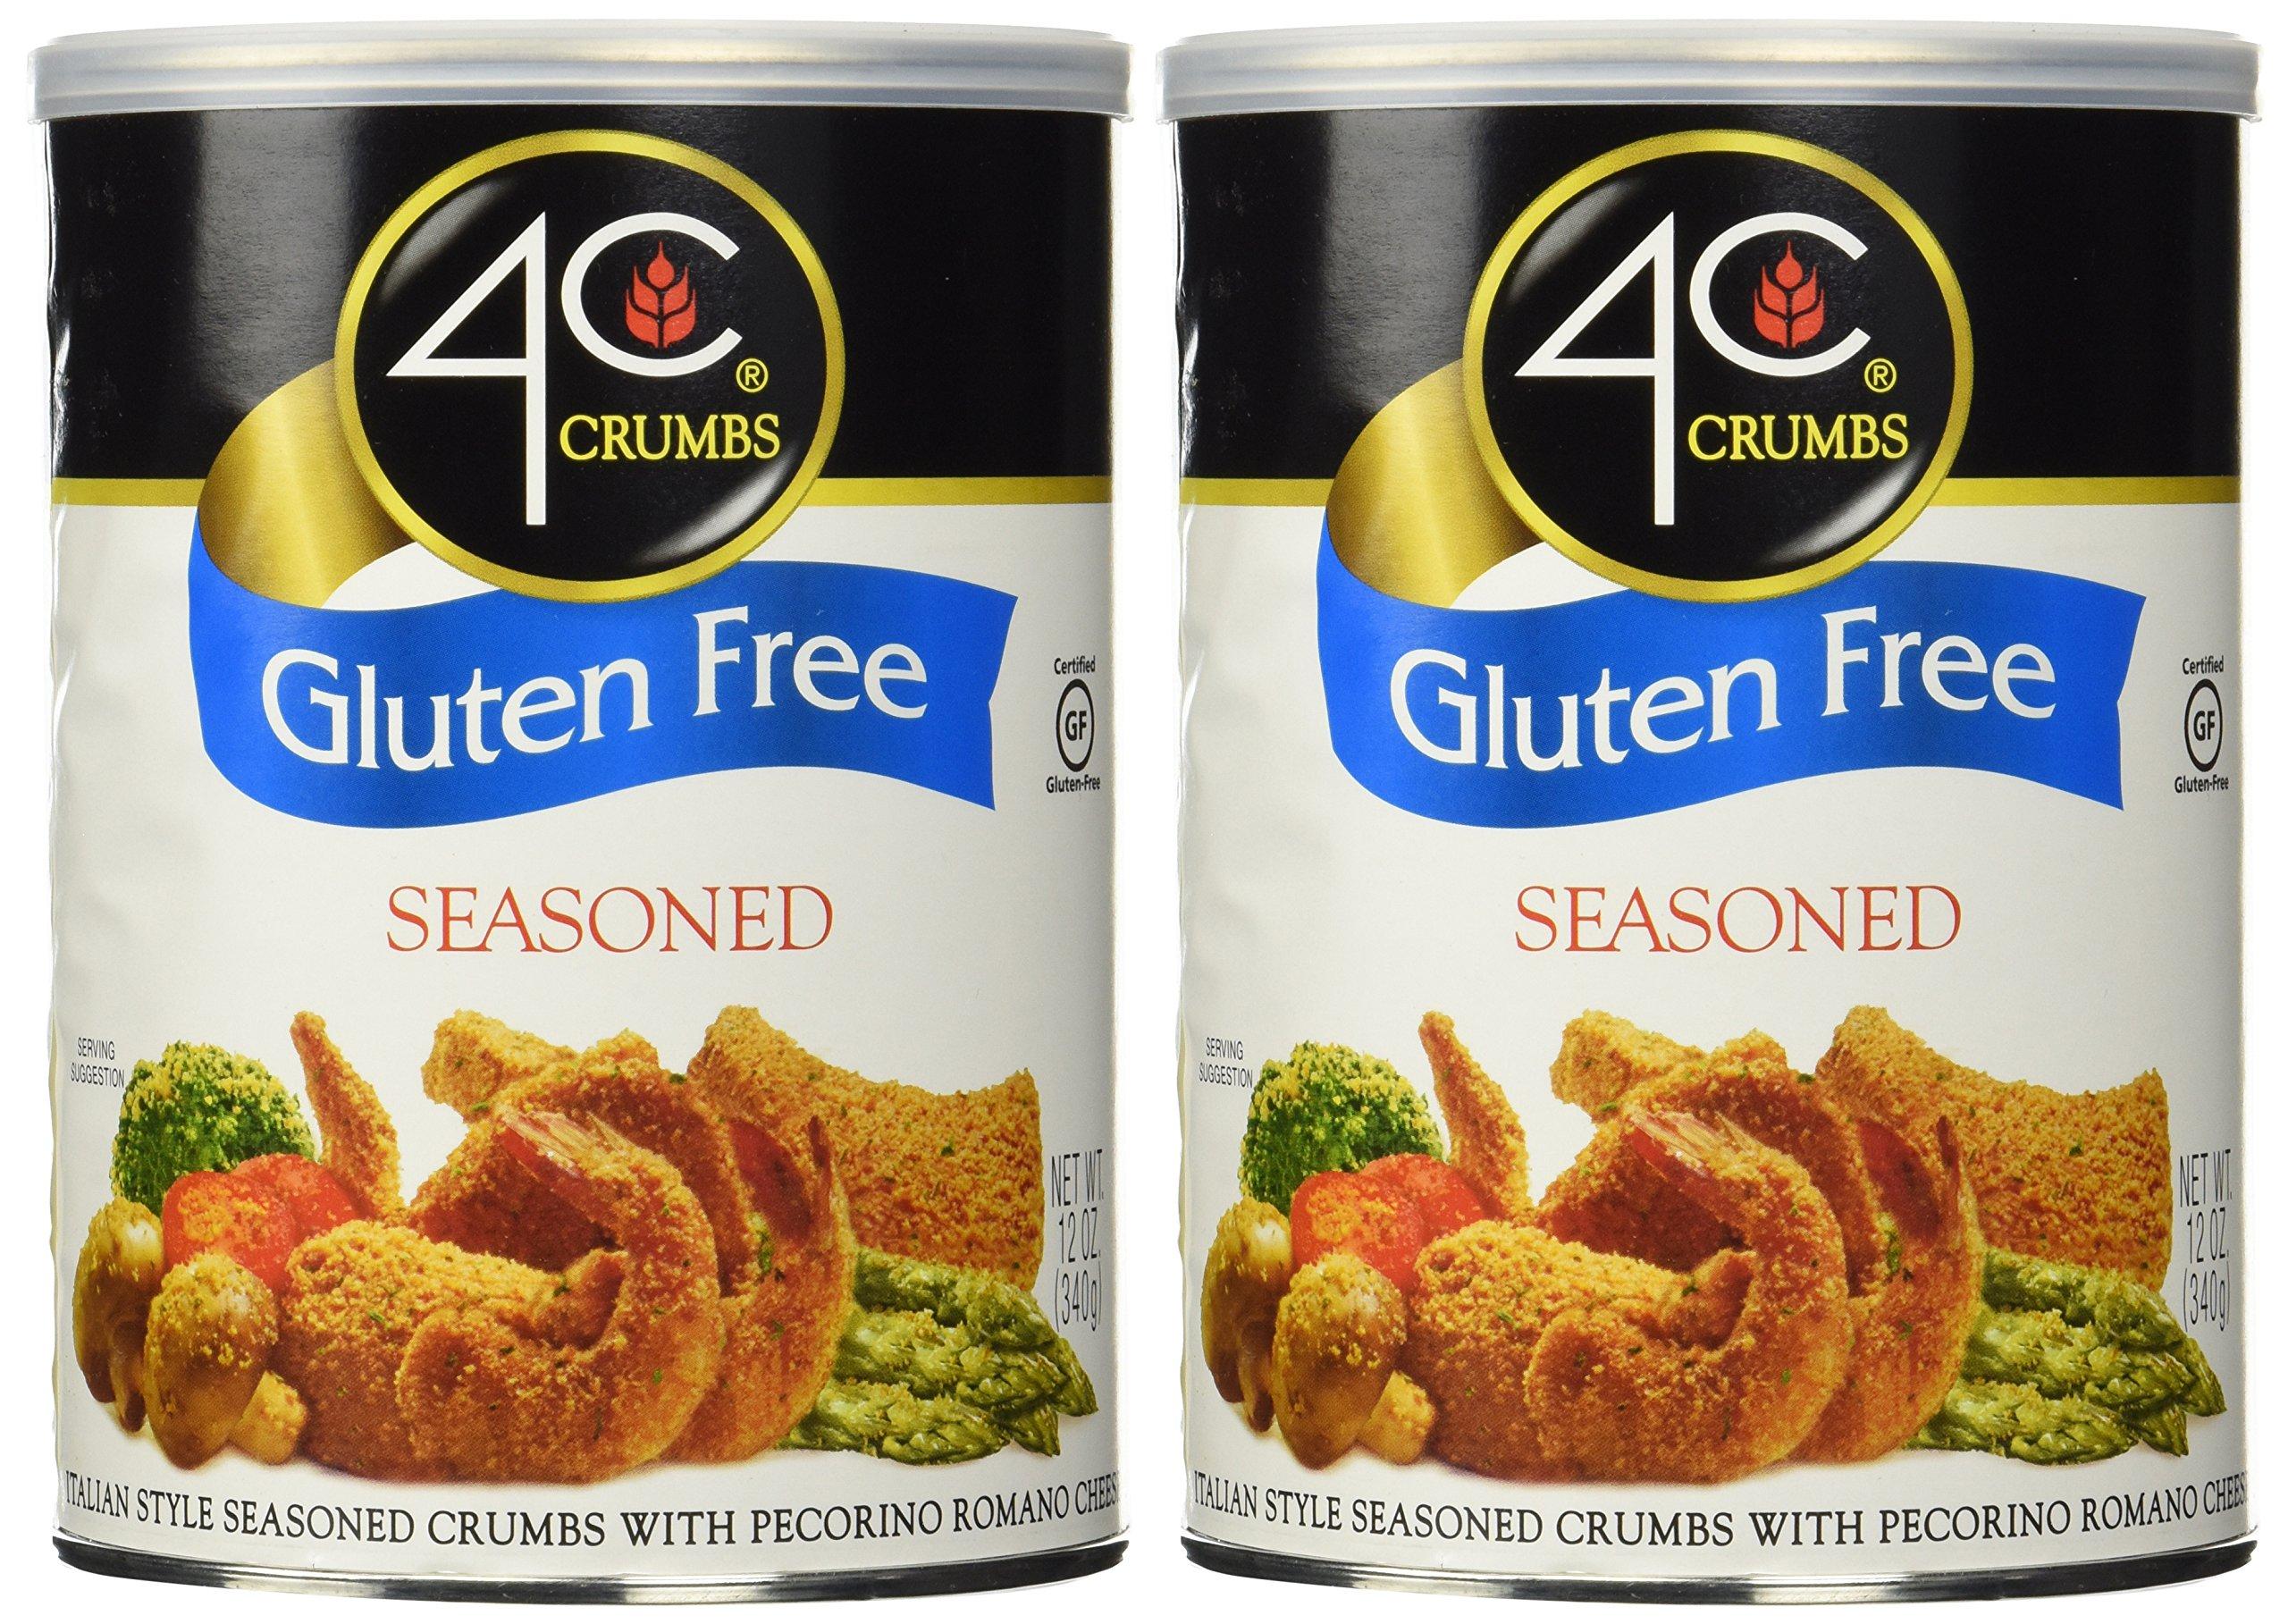 4C Gluten Free Crumbs Seasoned, 12 Ounce (Pack Of 2) by 4C